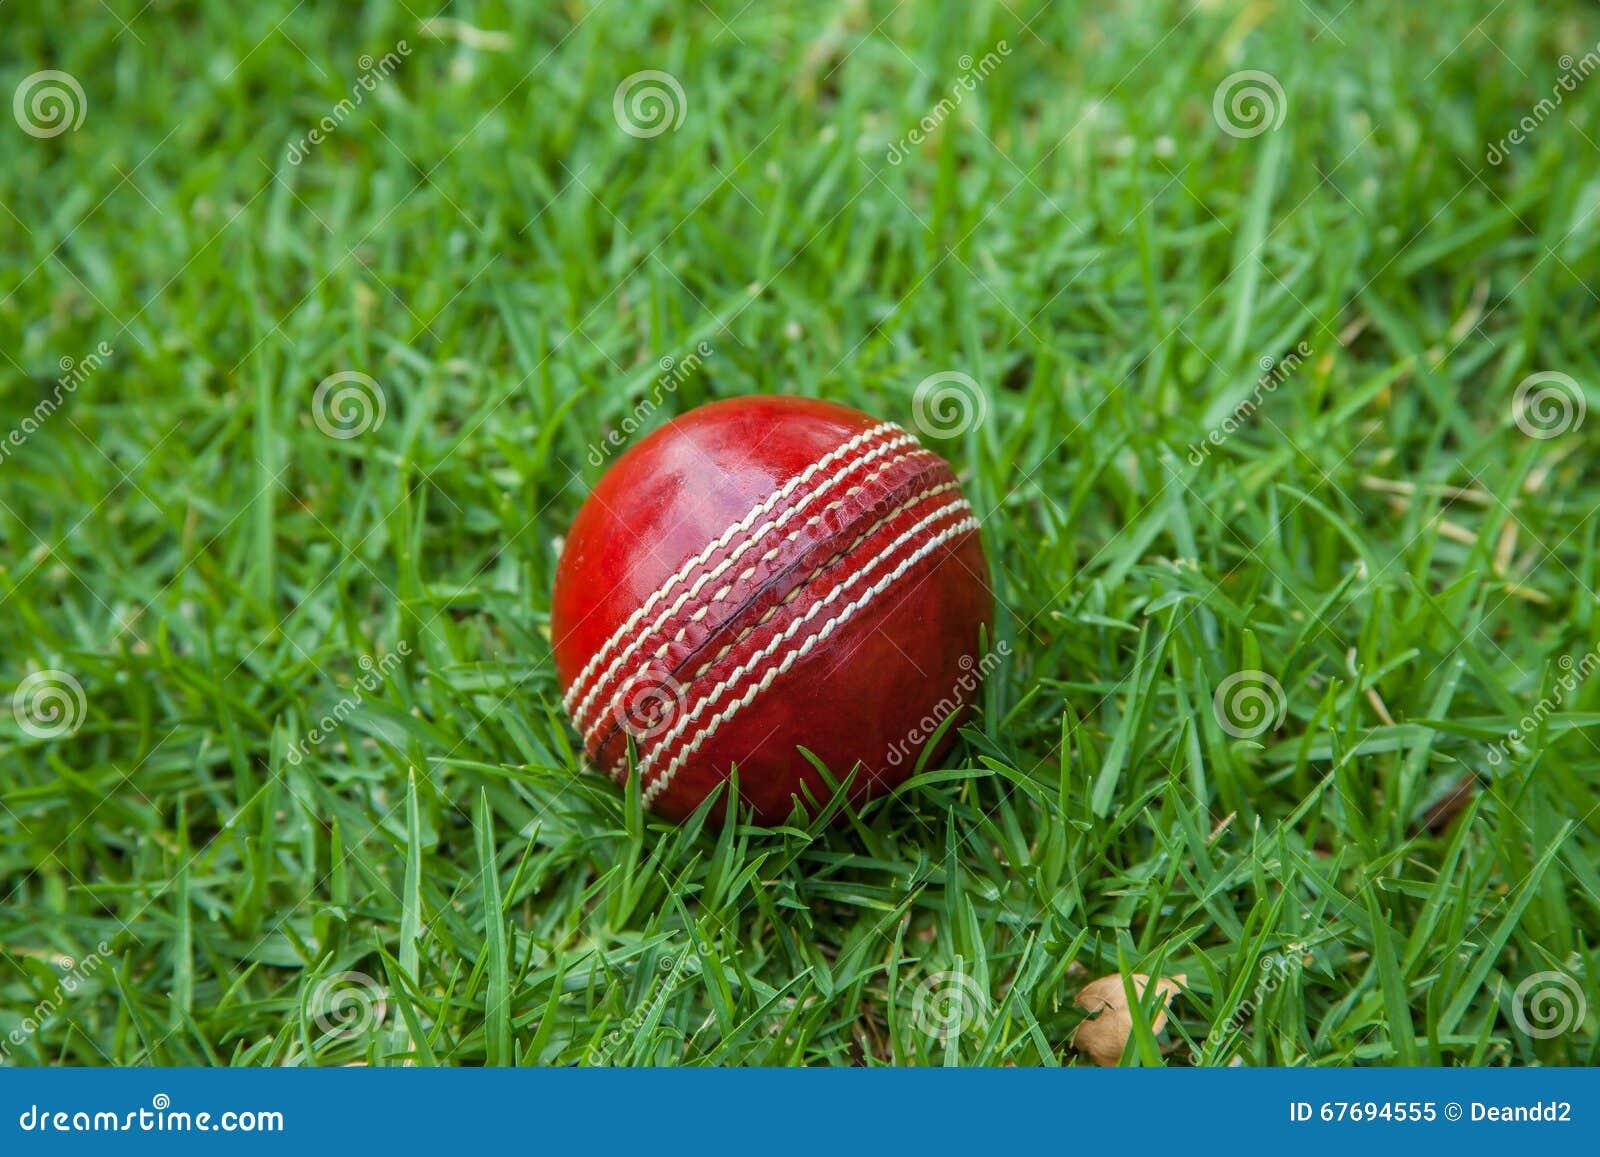 Cork Ball Cricket Bat: Cricket Ball Stock Photo